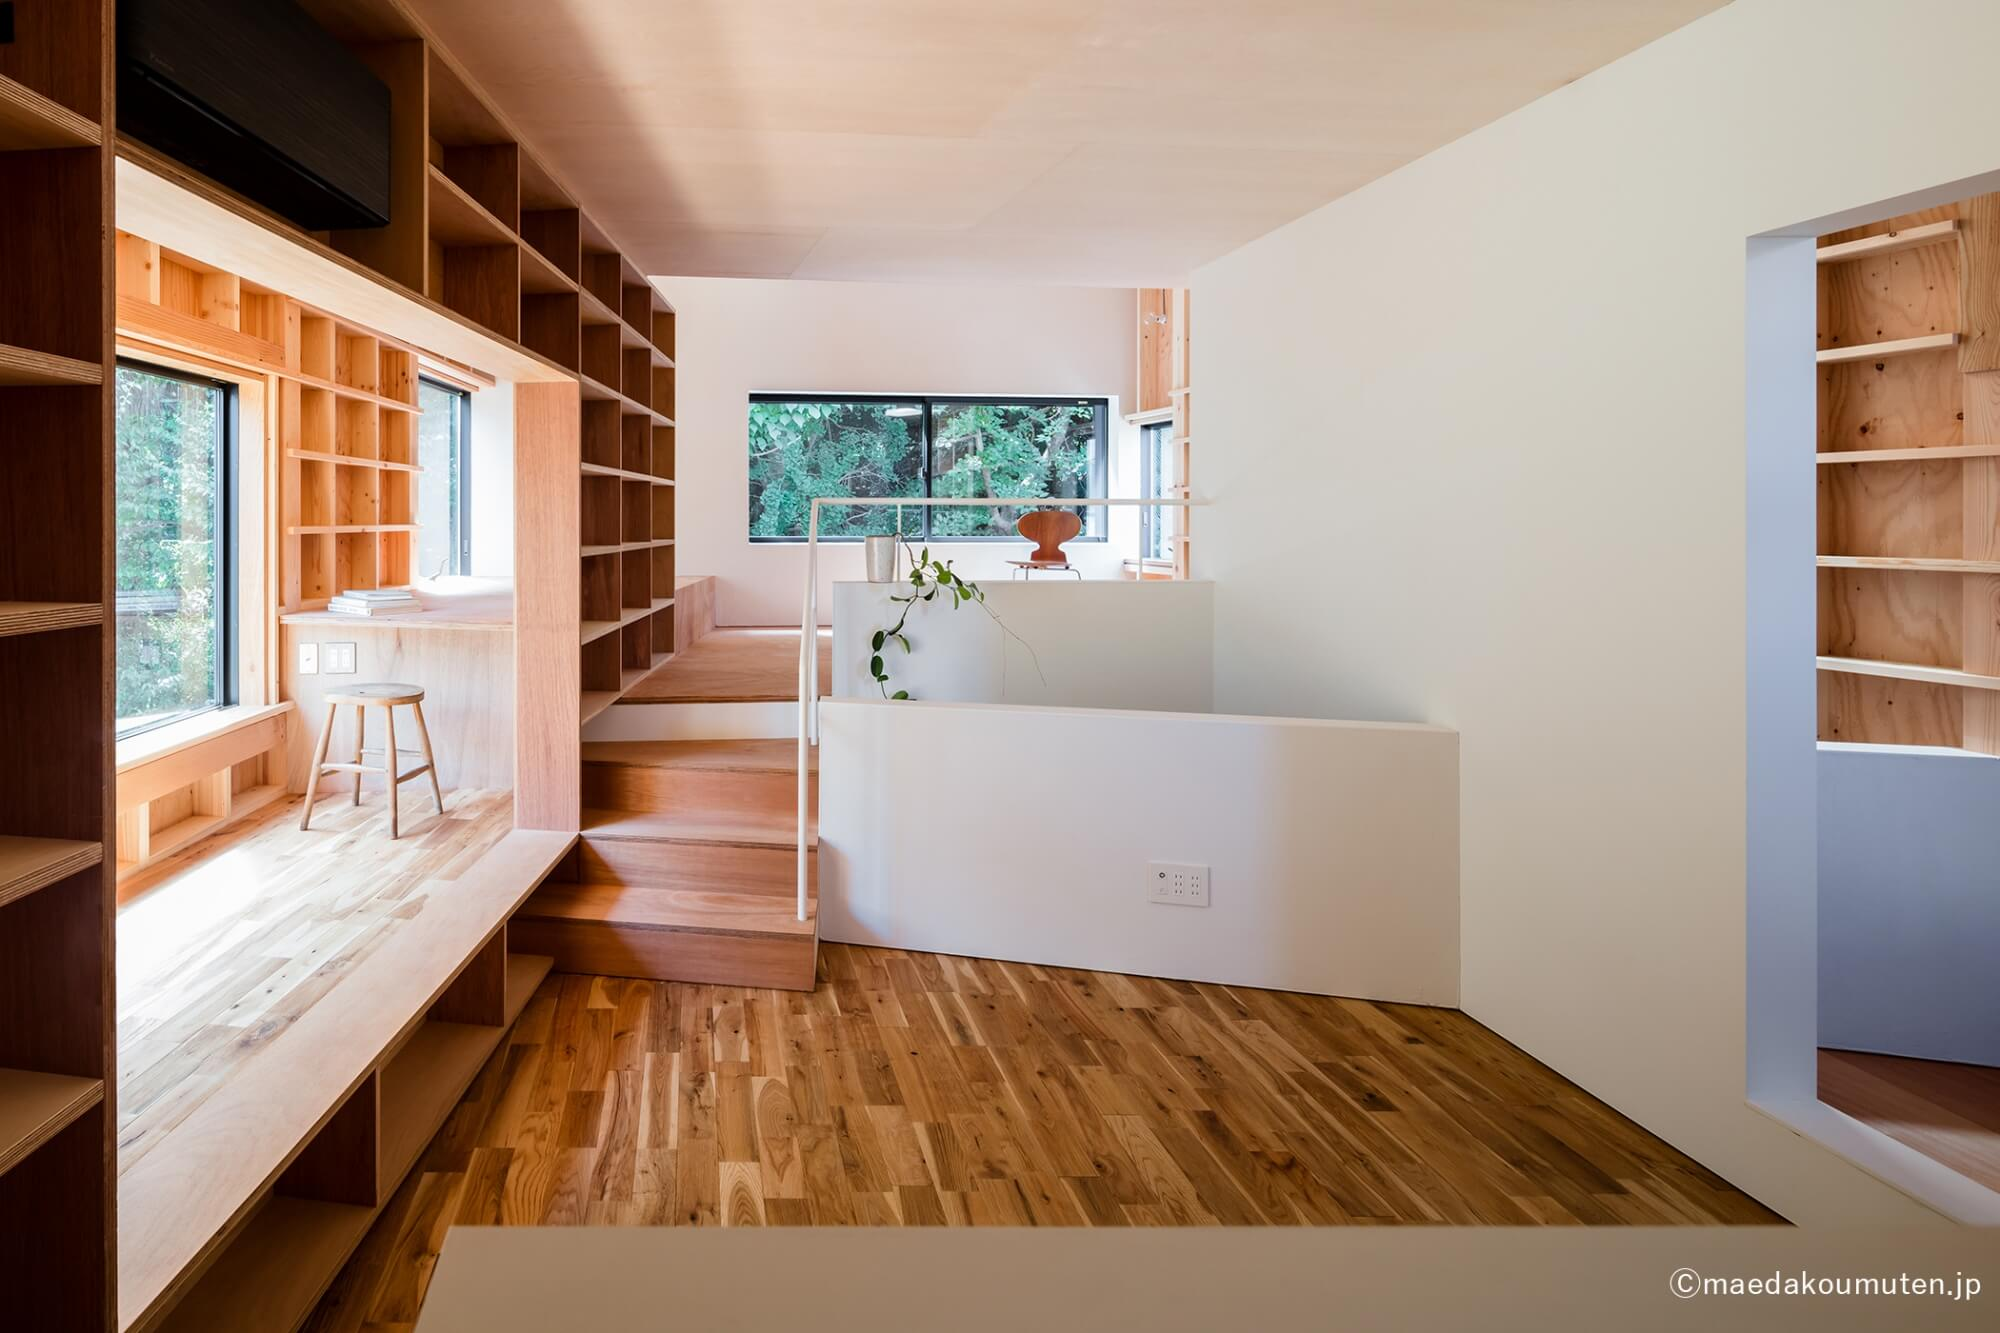 神奈川、工務店、注文住宅、デザイン住宅、建築家、亀井野の家、18